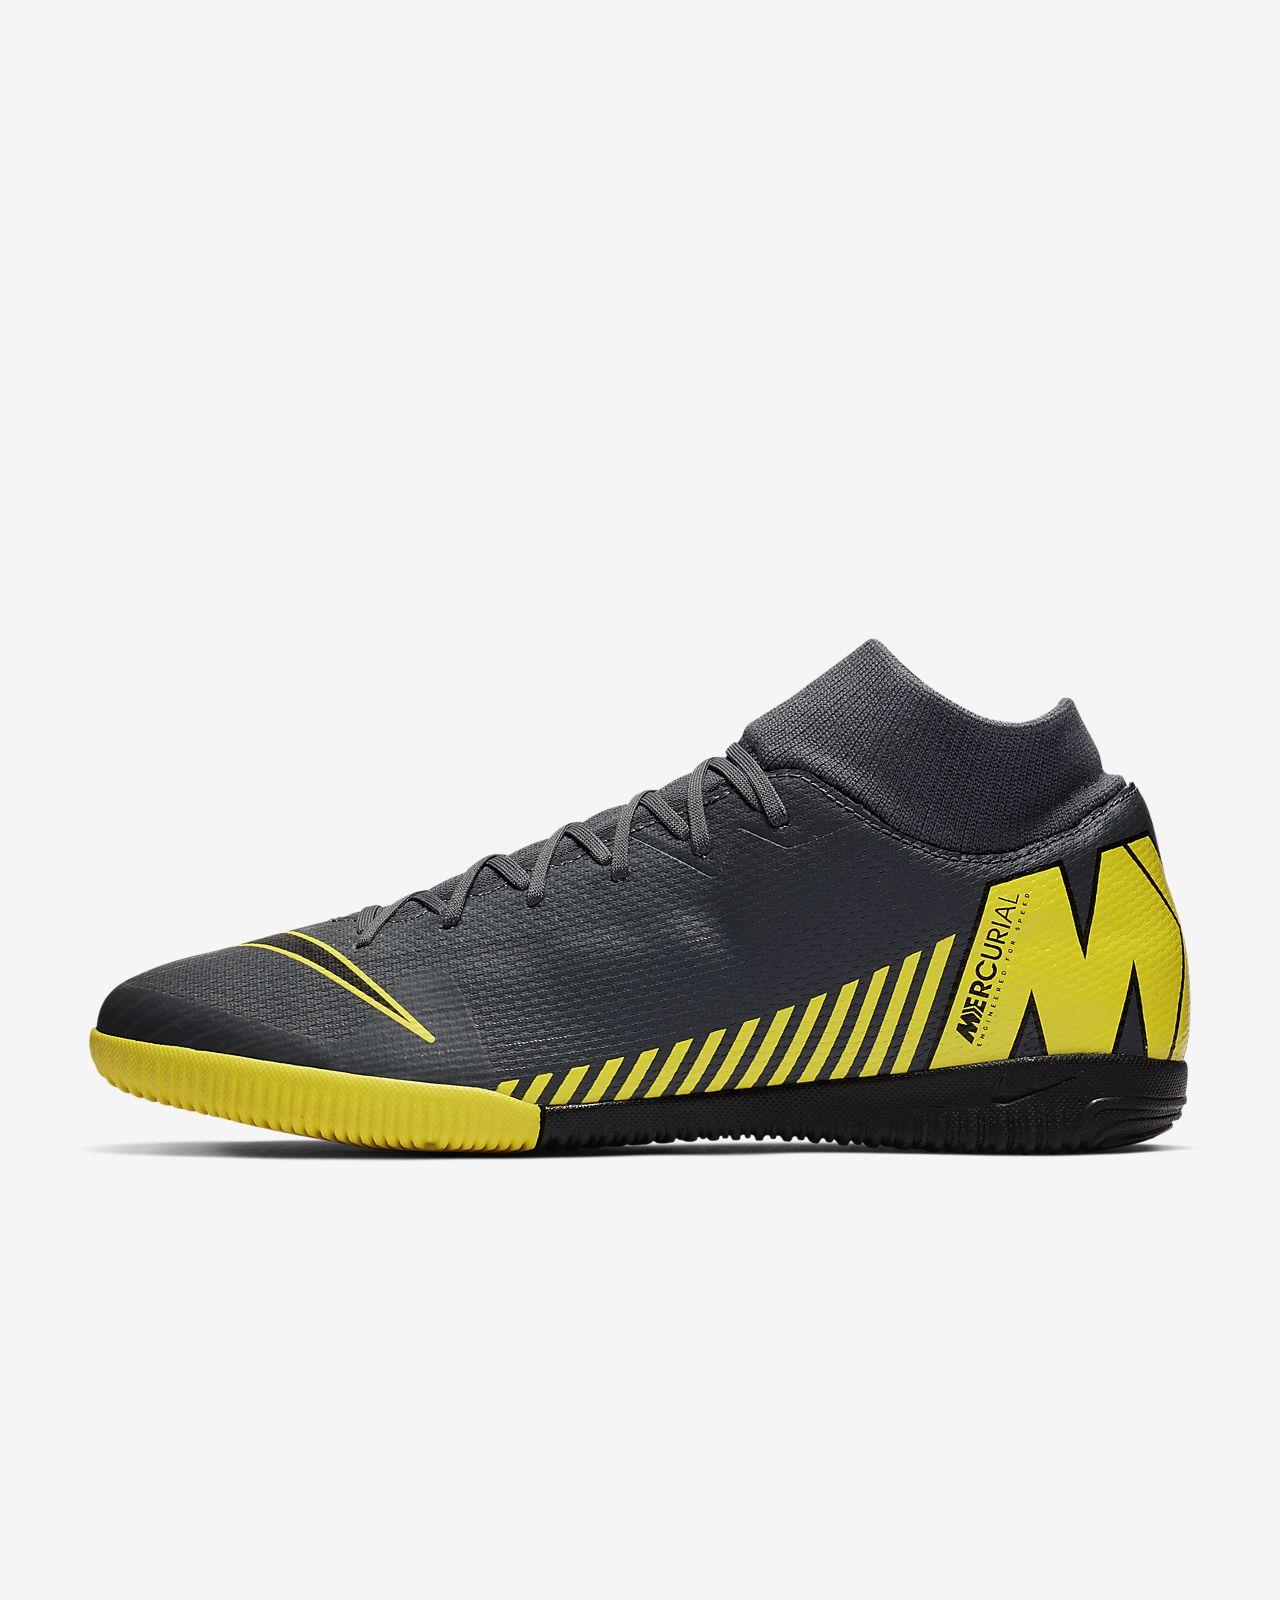 32730150a44ad Nike SuperflyX 6 Academy IC Botas de fútbol sala. Nike.com ES